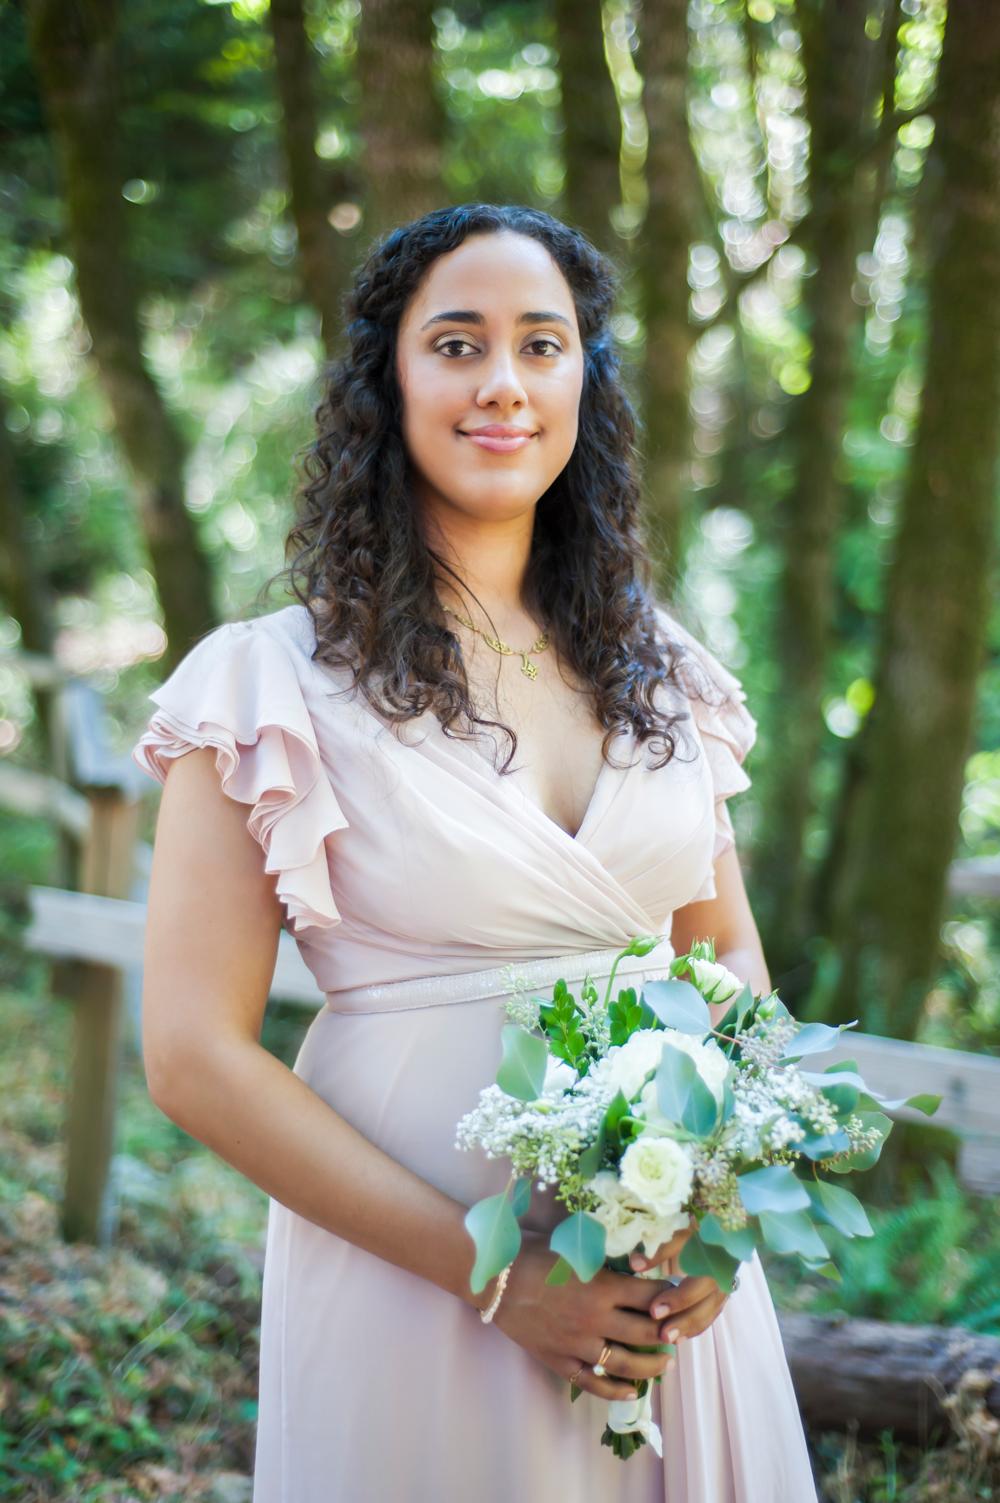 ralston-white-retreat-mill-valley-wedding-photography-lilouette-35.jpg